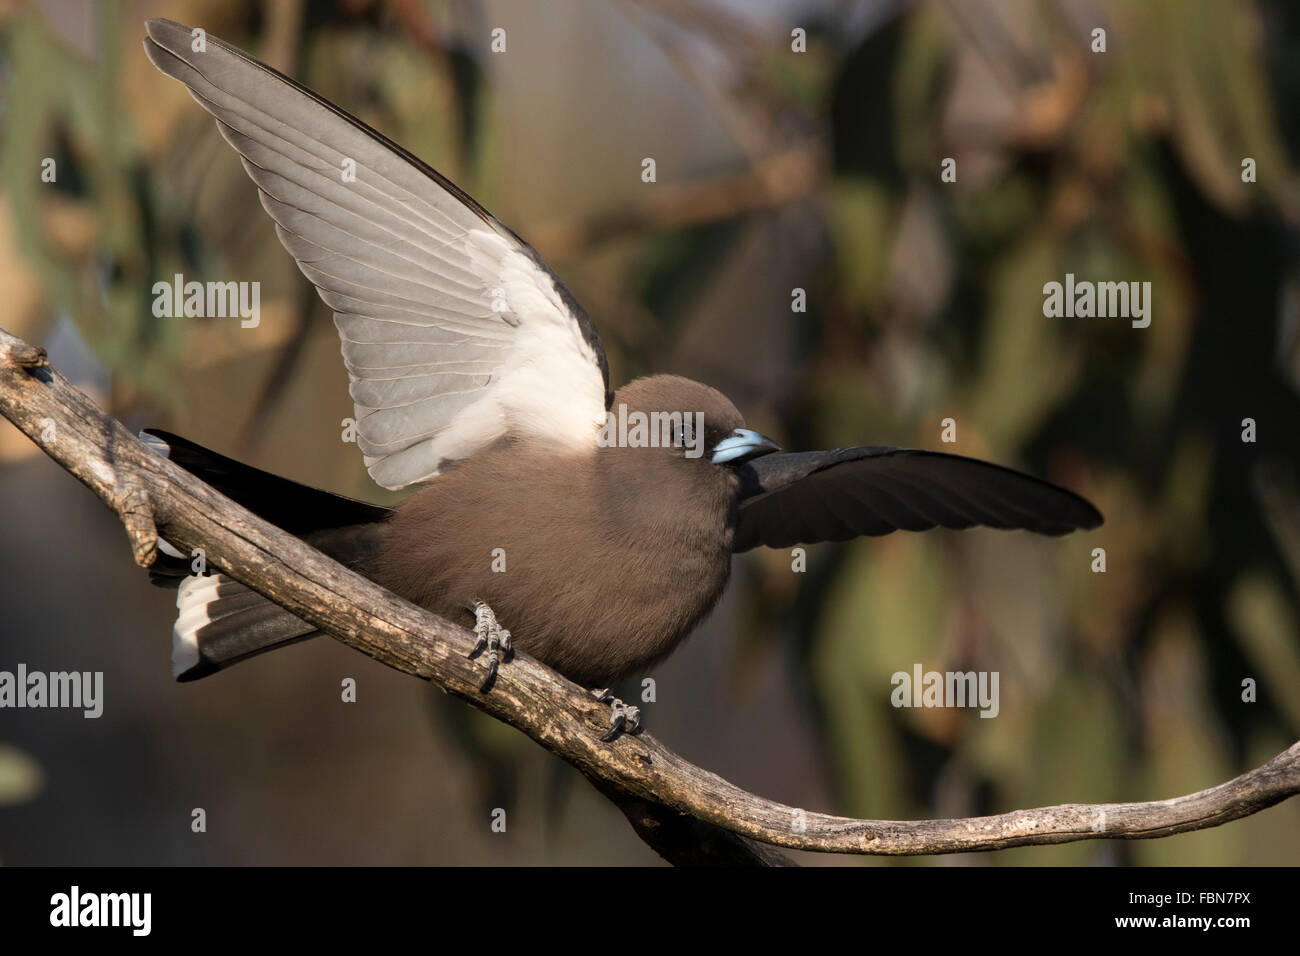 Dusky Woodswallow (Artamus cyanopterus) displaying on a branch - Stock Image